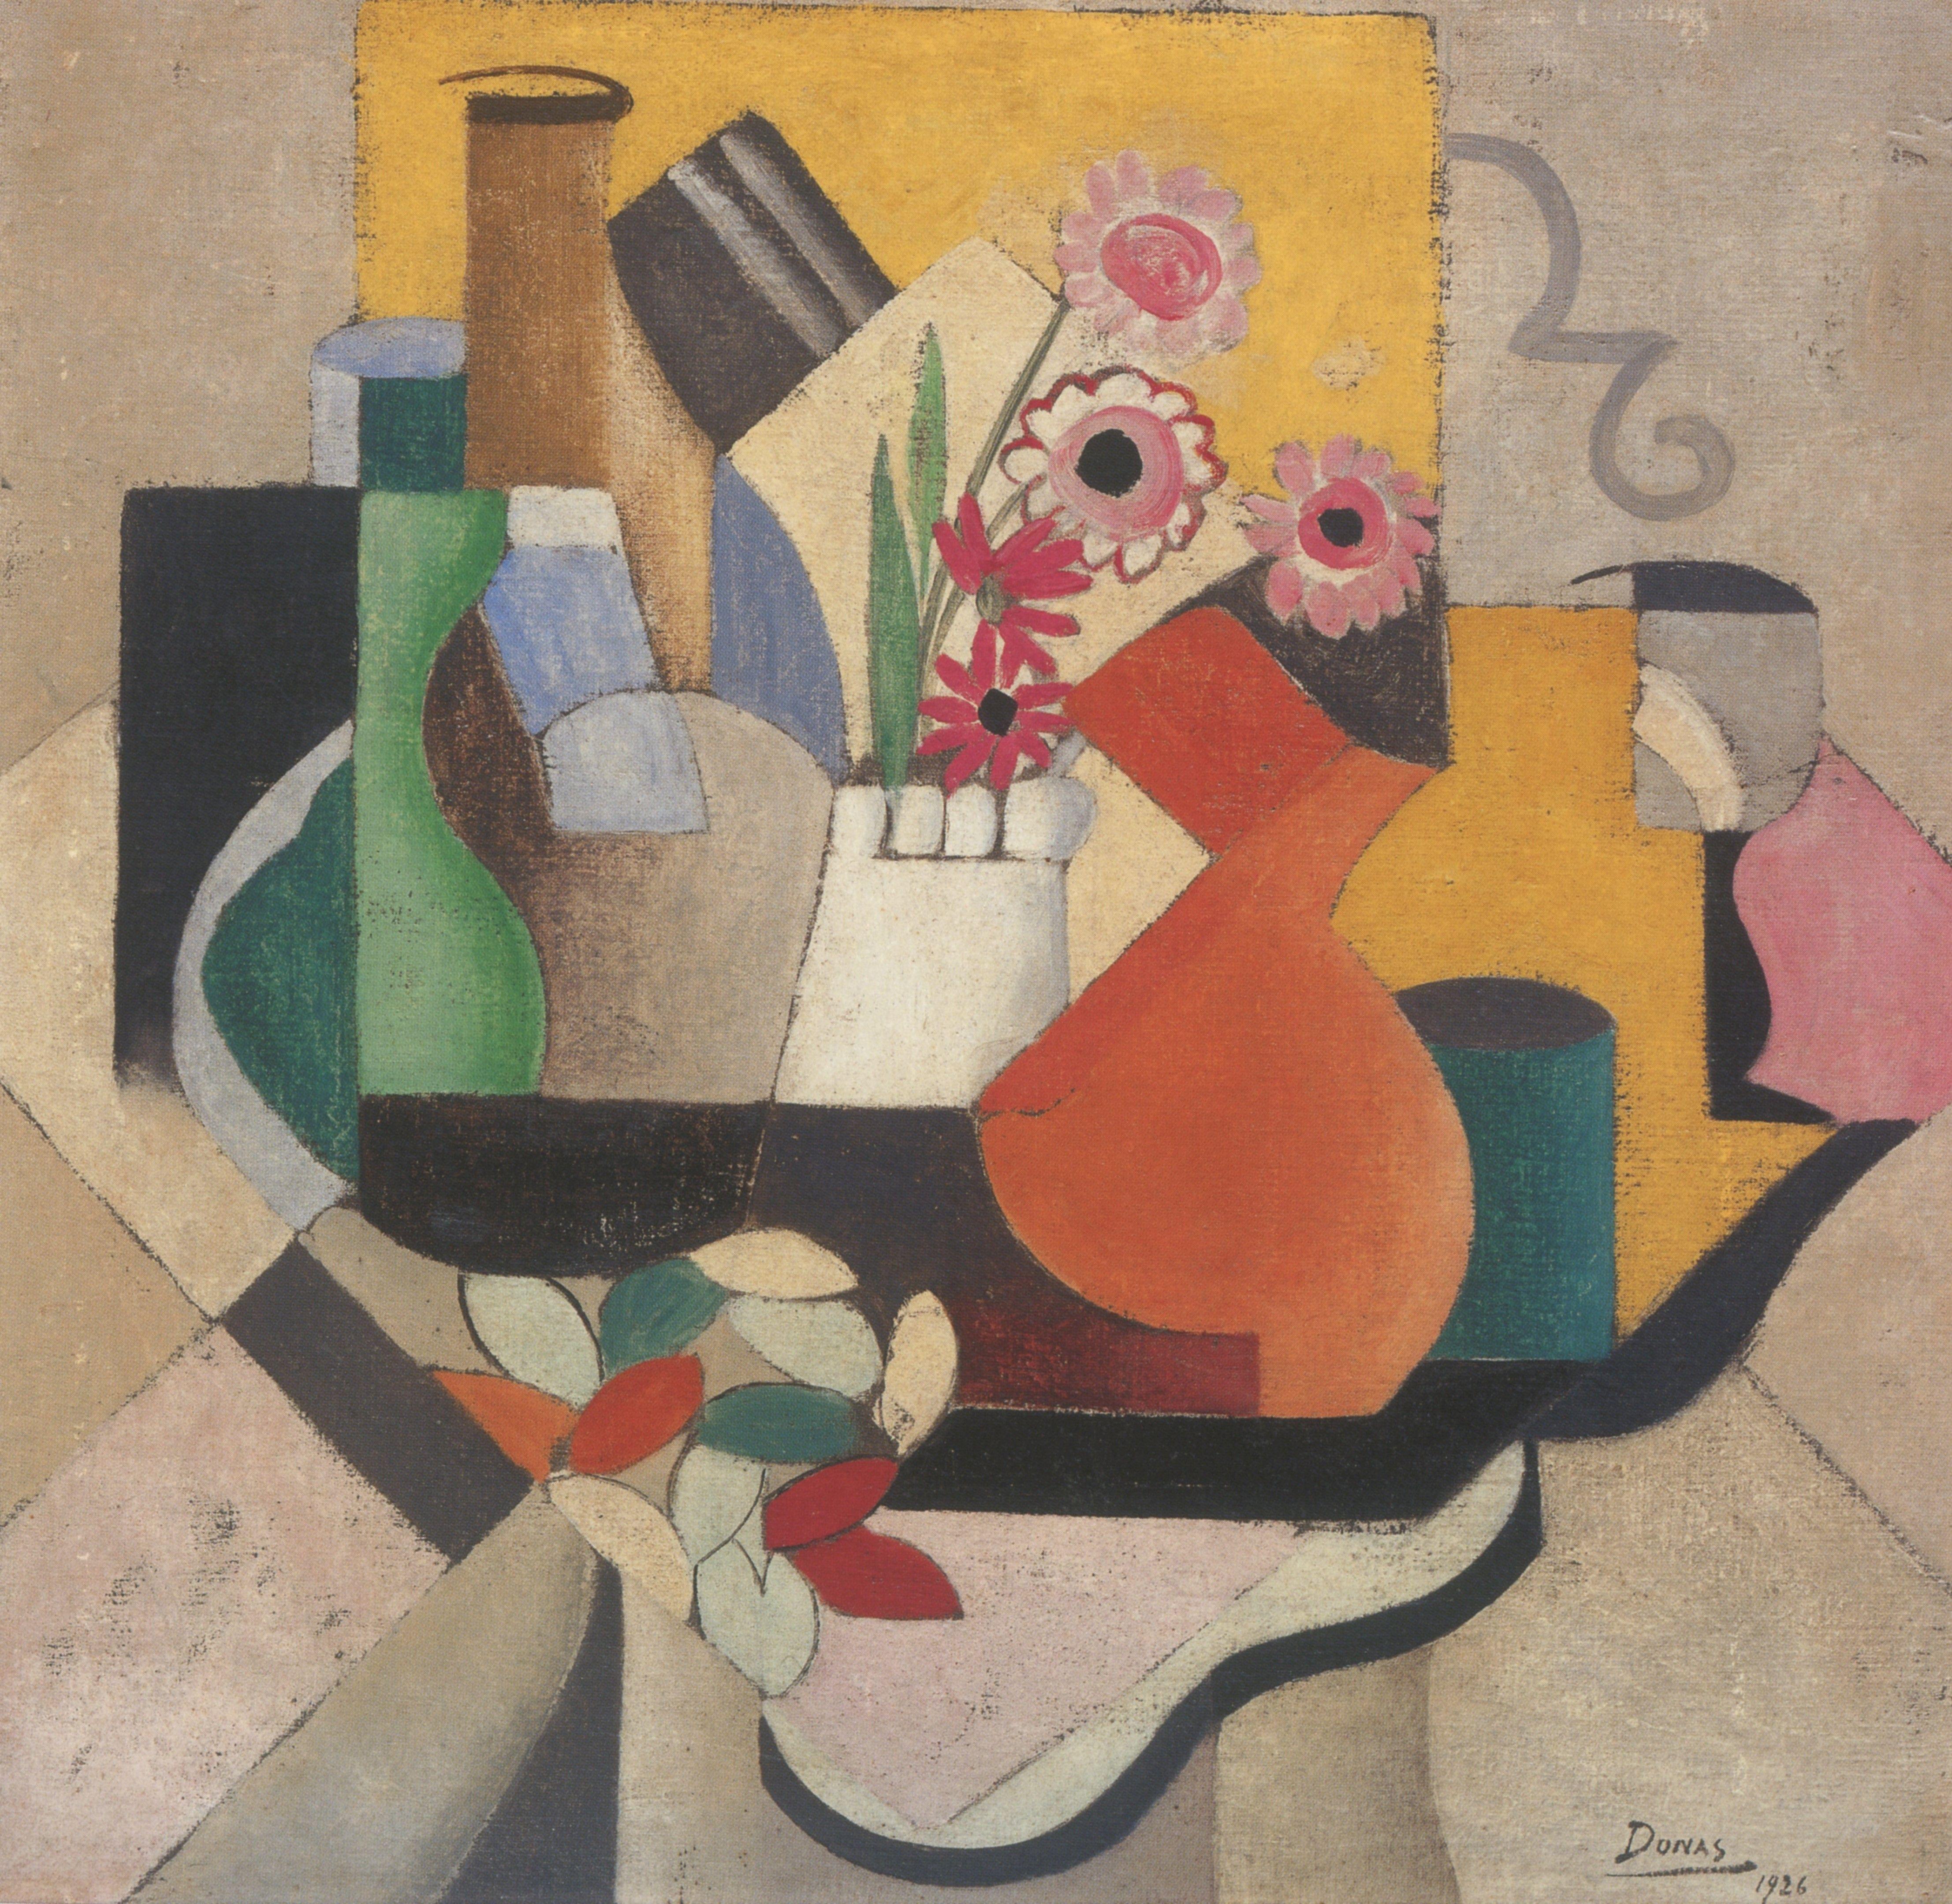 Marthe Donas Pots And Flowers 1926 Mskgent Museum Kunst Art